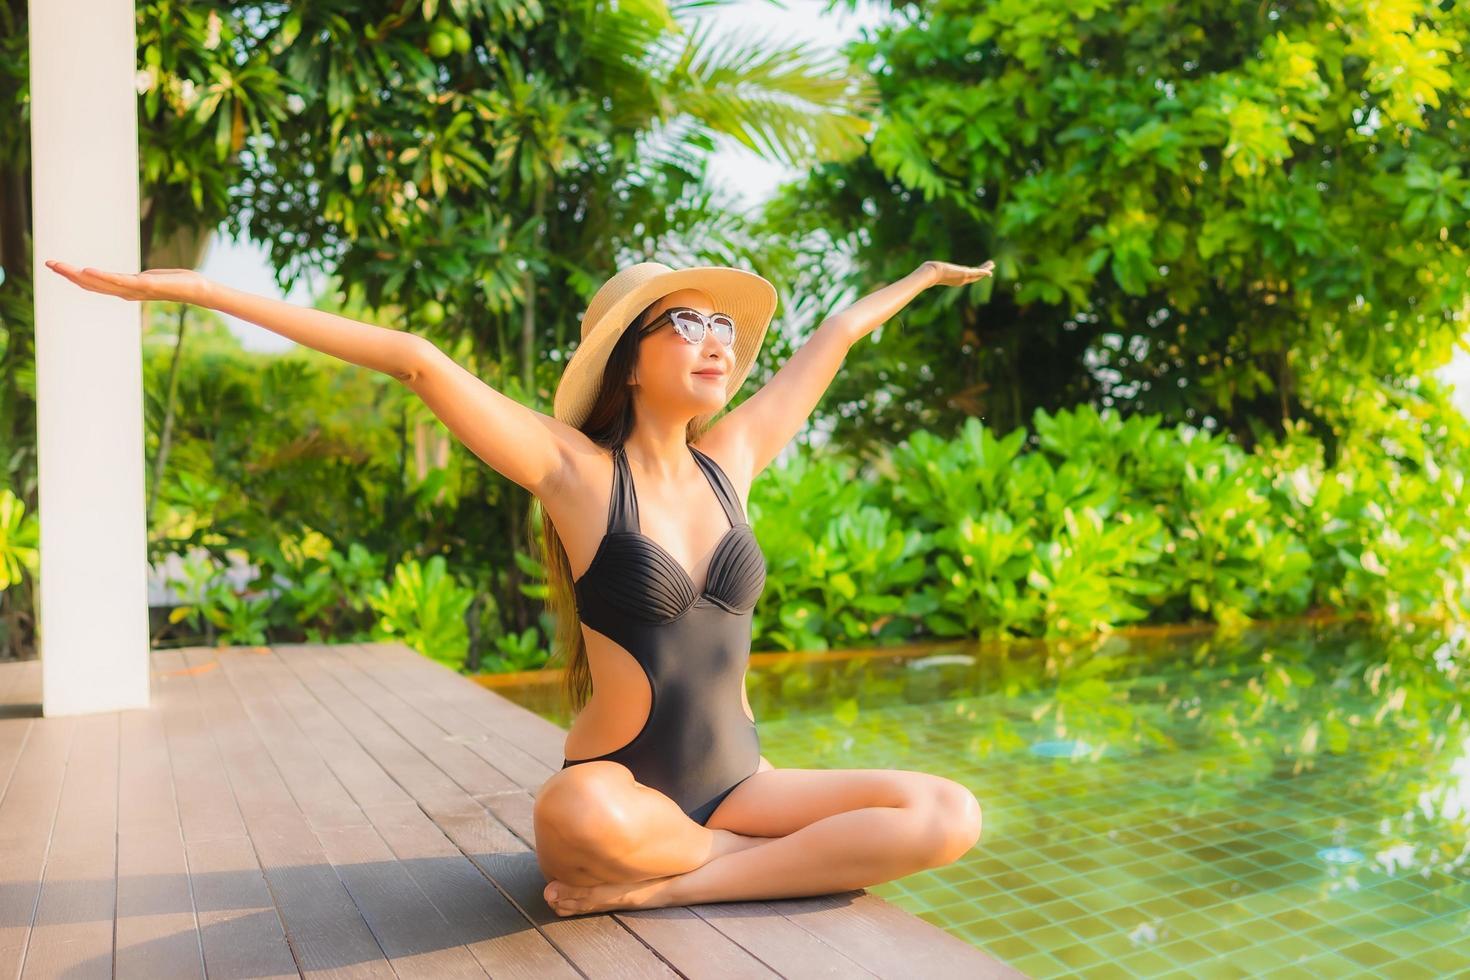 donna rilassante in piscina foto